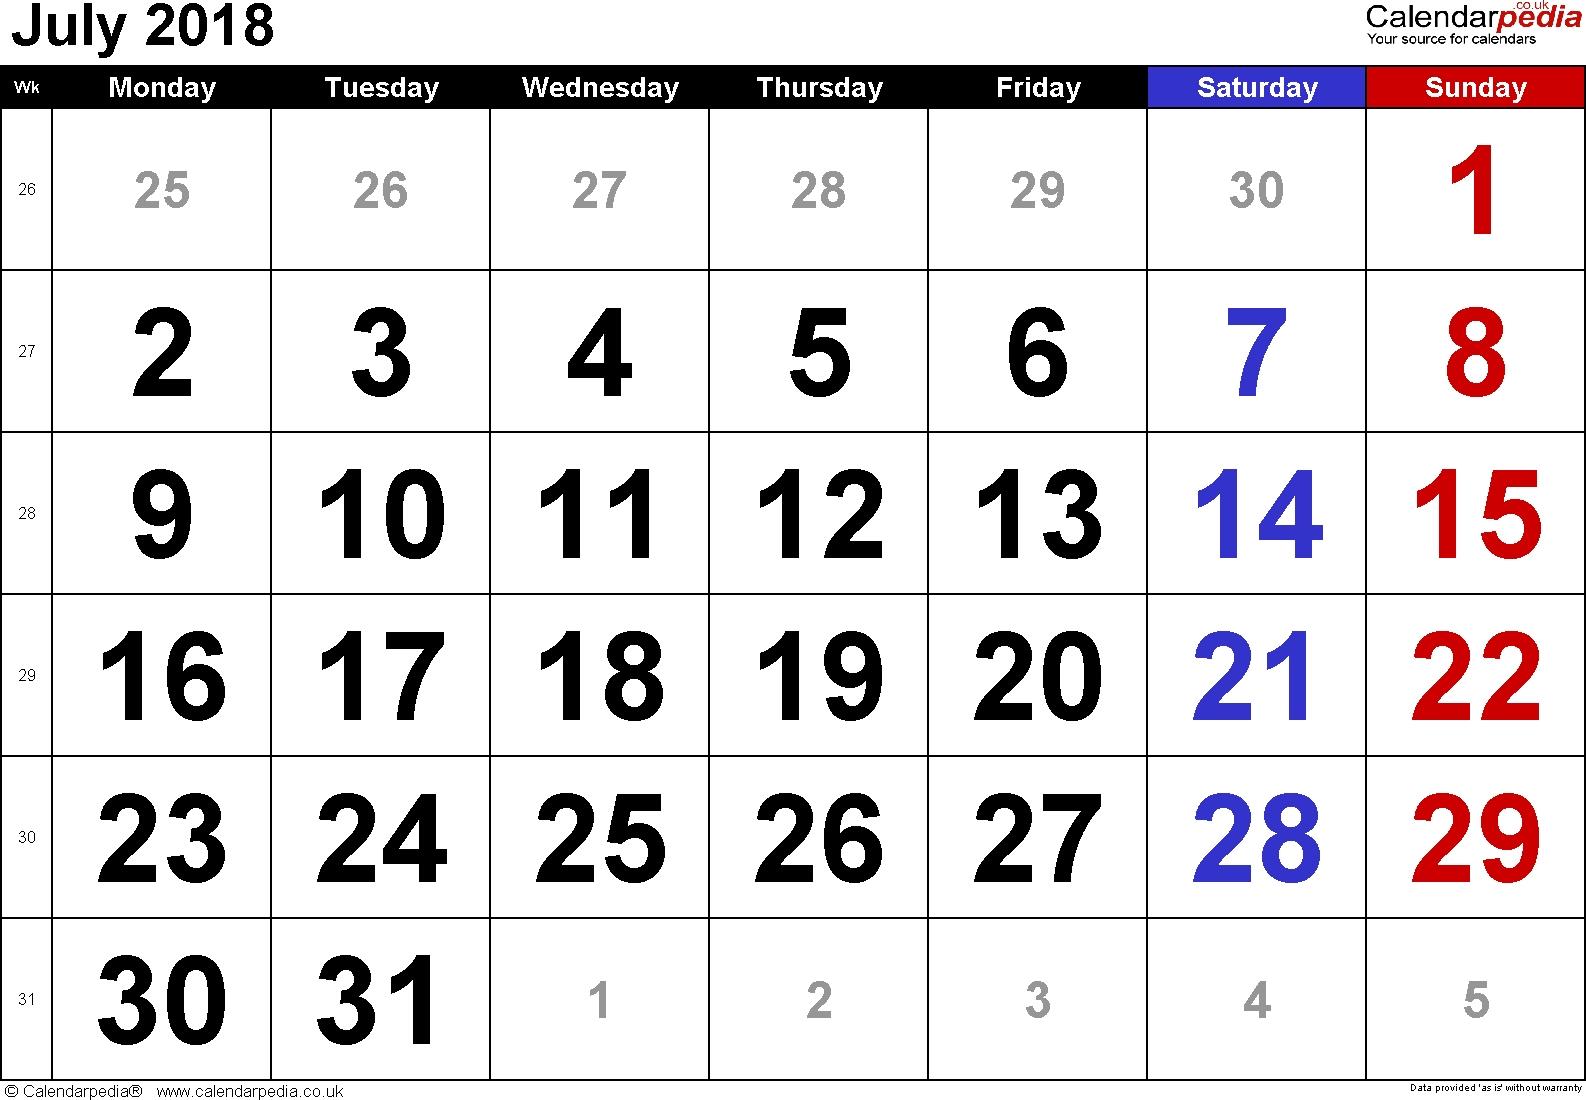 Calendar July 2018 Uk, Bank Holidays, Excel/pdf/word Templates